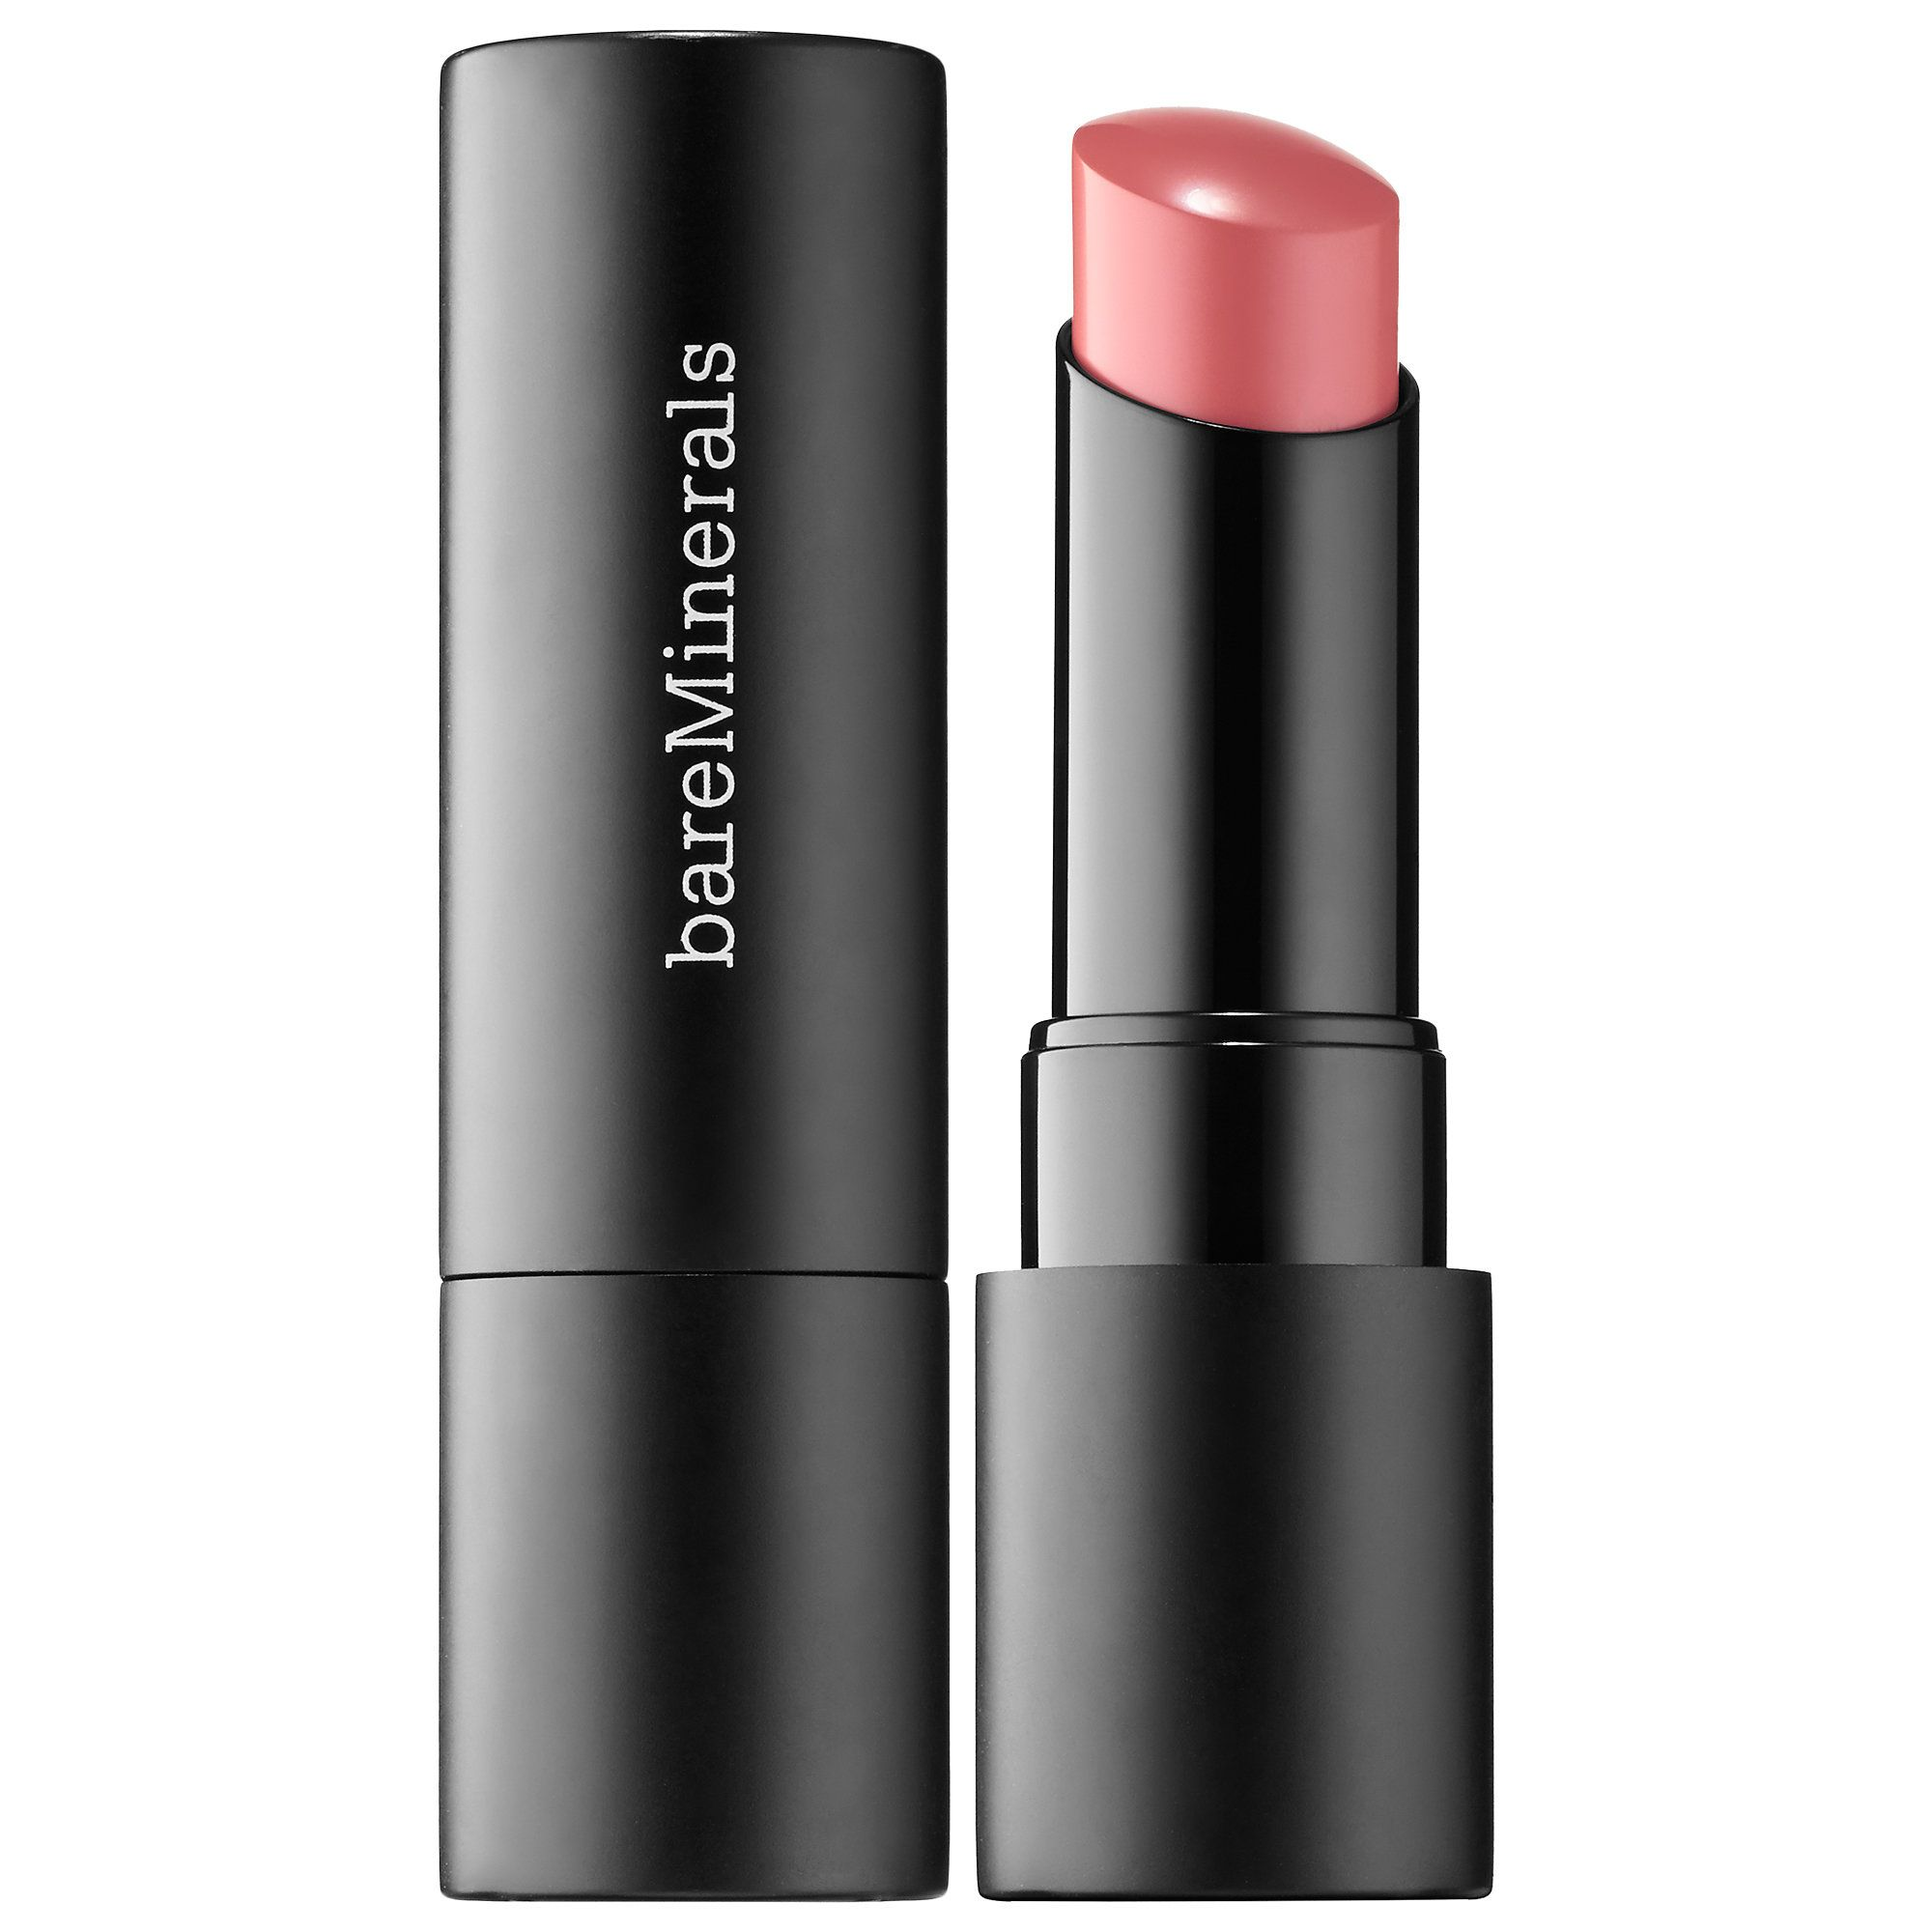 bareMinerals Gen Nude Radiant Lipstick 3.5g Queen